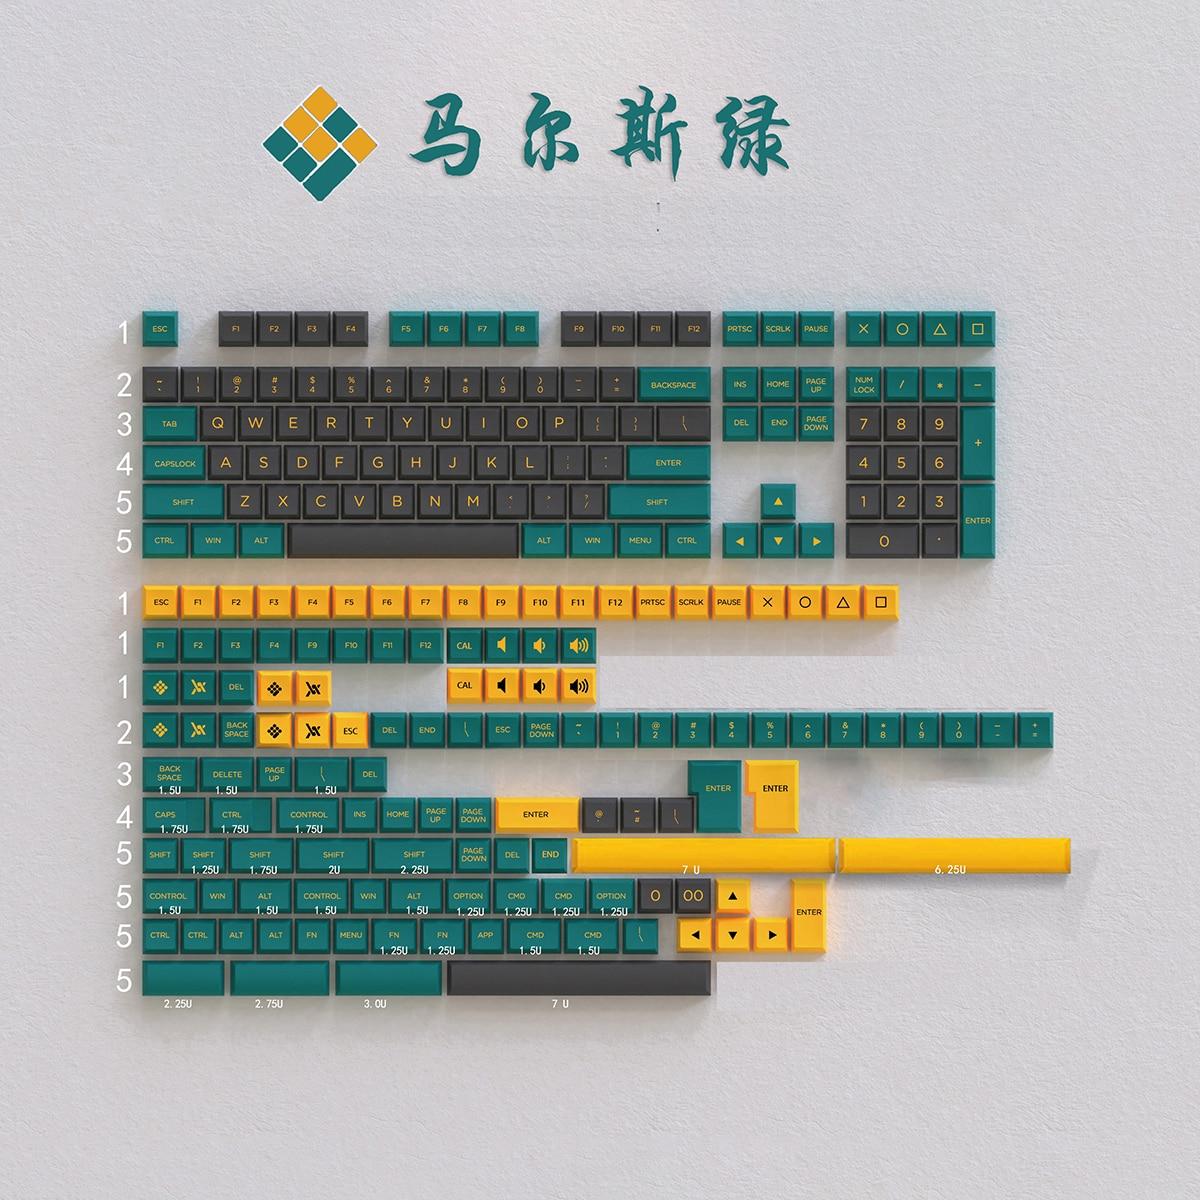 Keypro المريخ الأخضر موضوع OSA مزدوجة النار ABS Keycap 226 مفاتيح مجموعة ل USB السلكية الميكانيكية لوحة المفاتيح الكرز MX التبديل أغطية المفاتيح